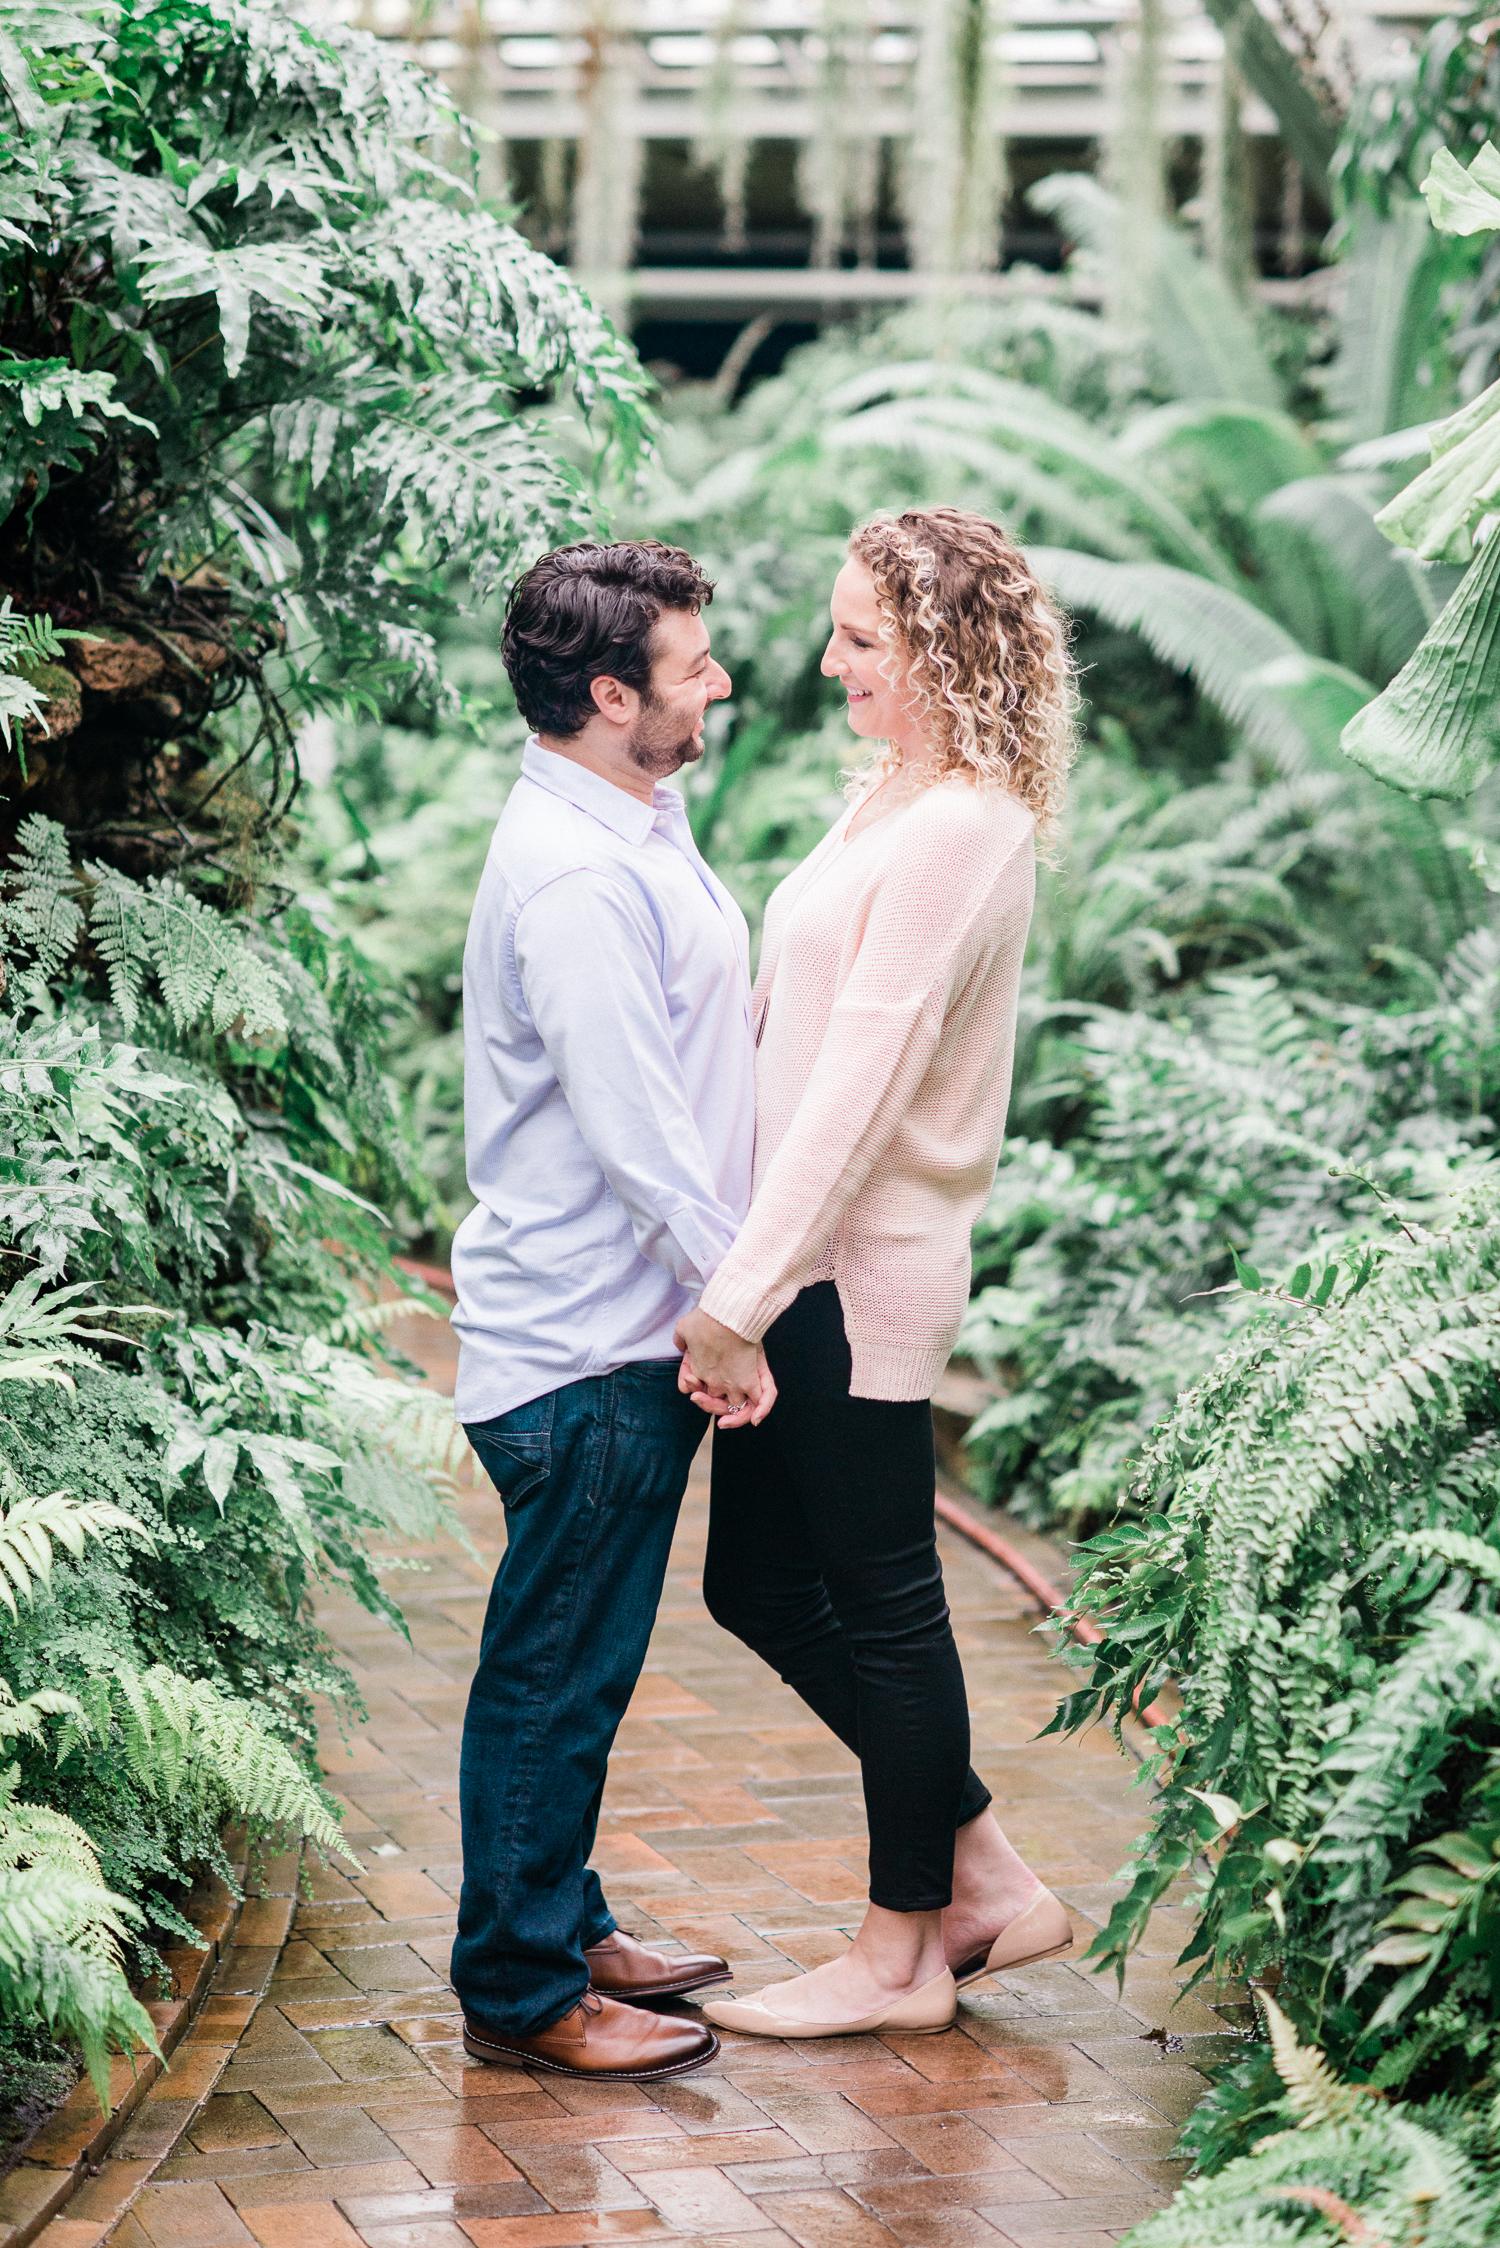 Brittany Bekas - Garfield Park Conservatory Chicago Engagement Photos-2.jpg